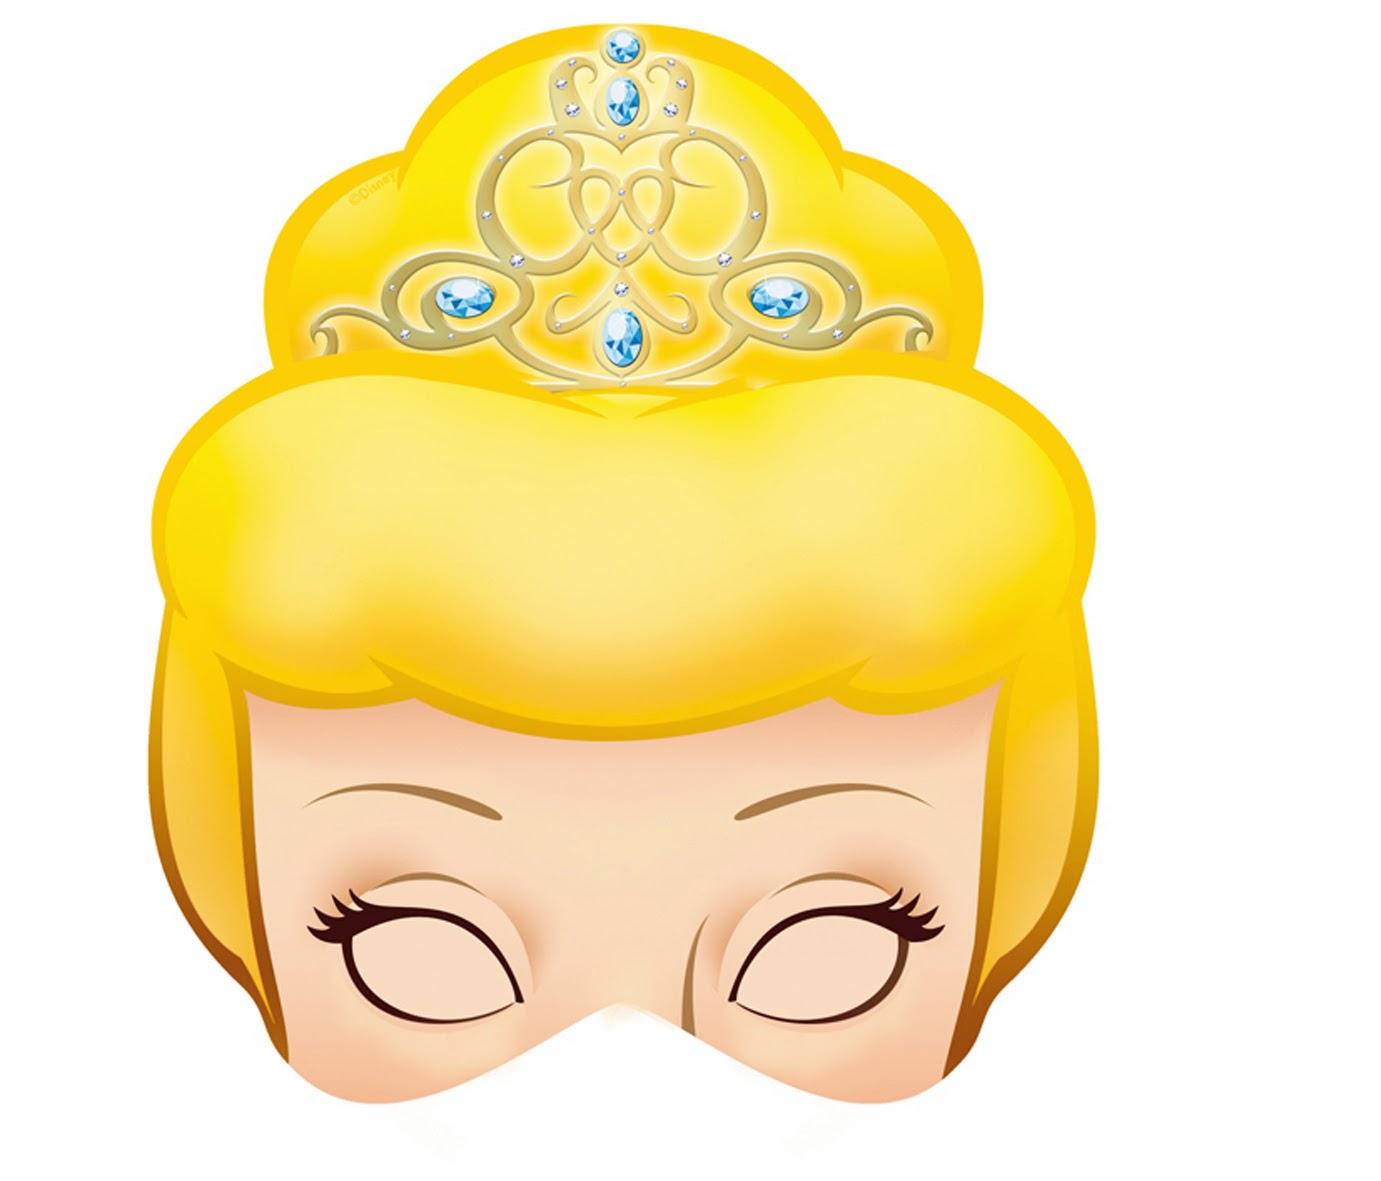 Cinderella Free Printable Masks. | Oh My Fiesta! In English - Free Printable Masks